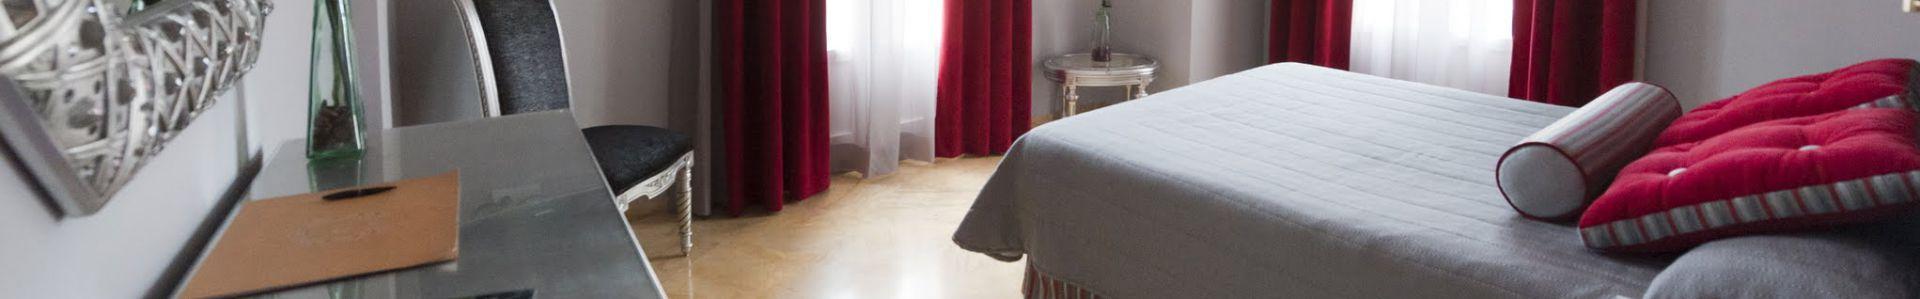 Sevilla Hotelzimmer in Superior Deluxe